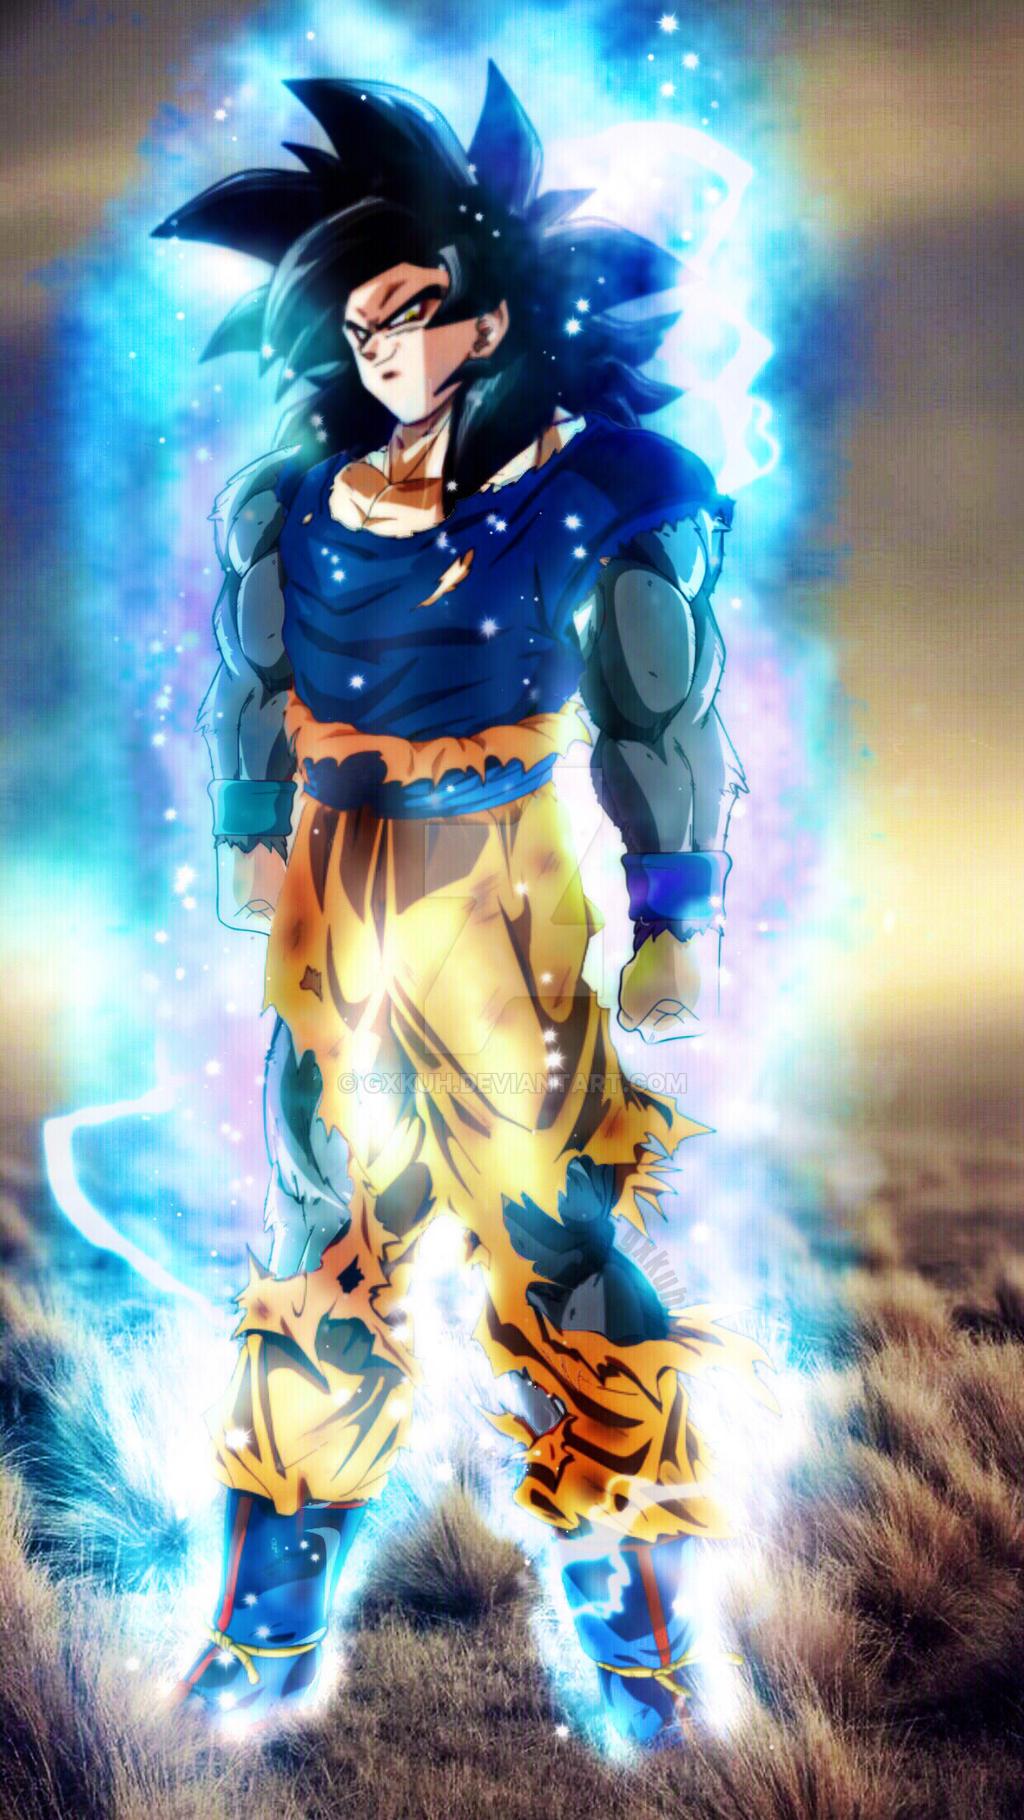 ultra Instinct (Ssj4 Goku) by gxkuh on DeviantArt